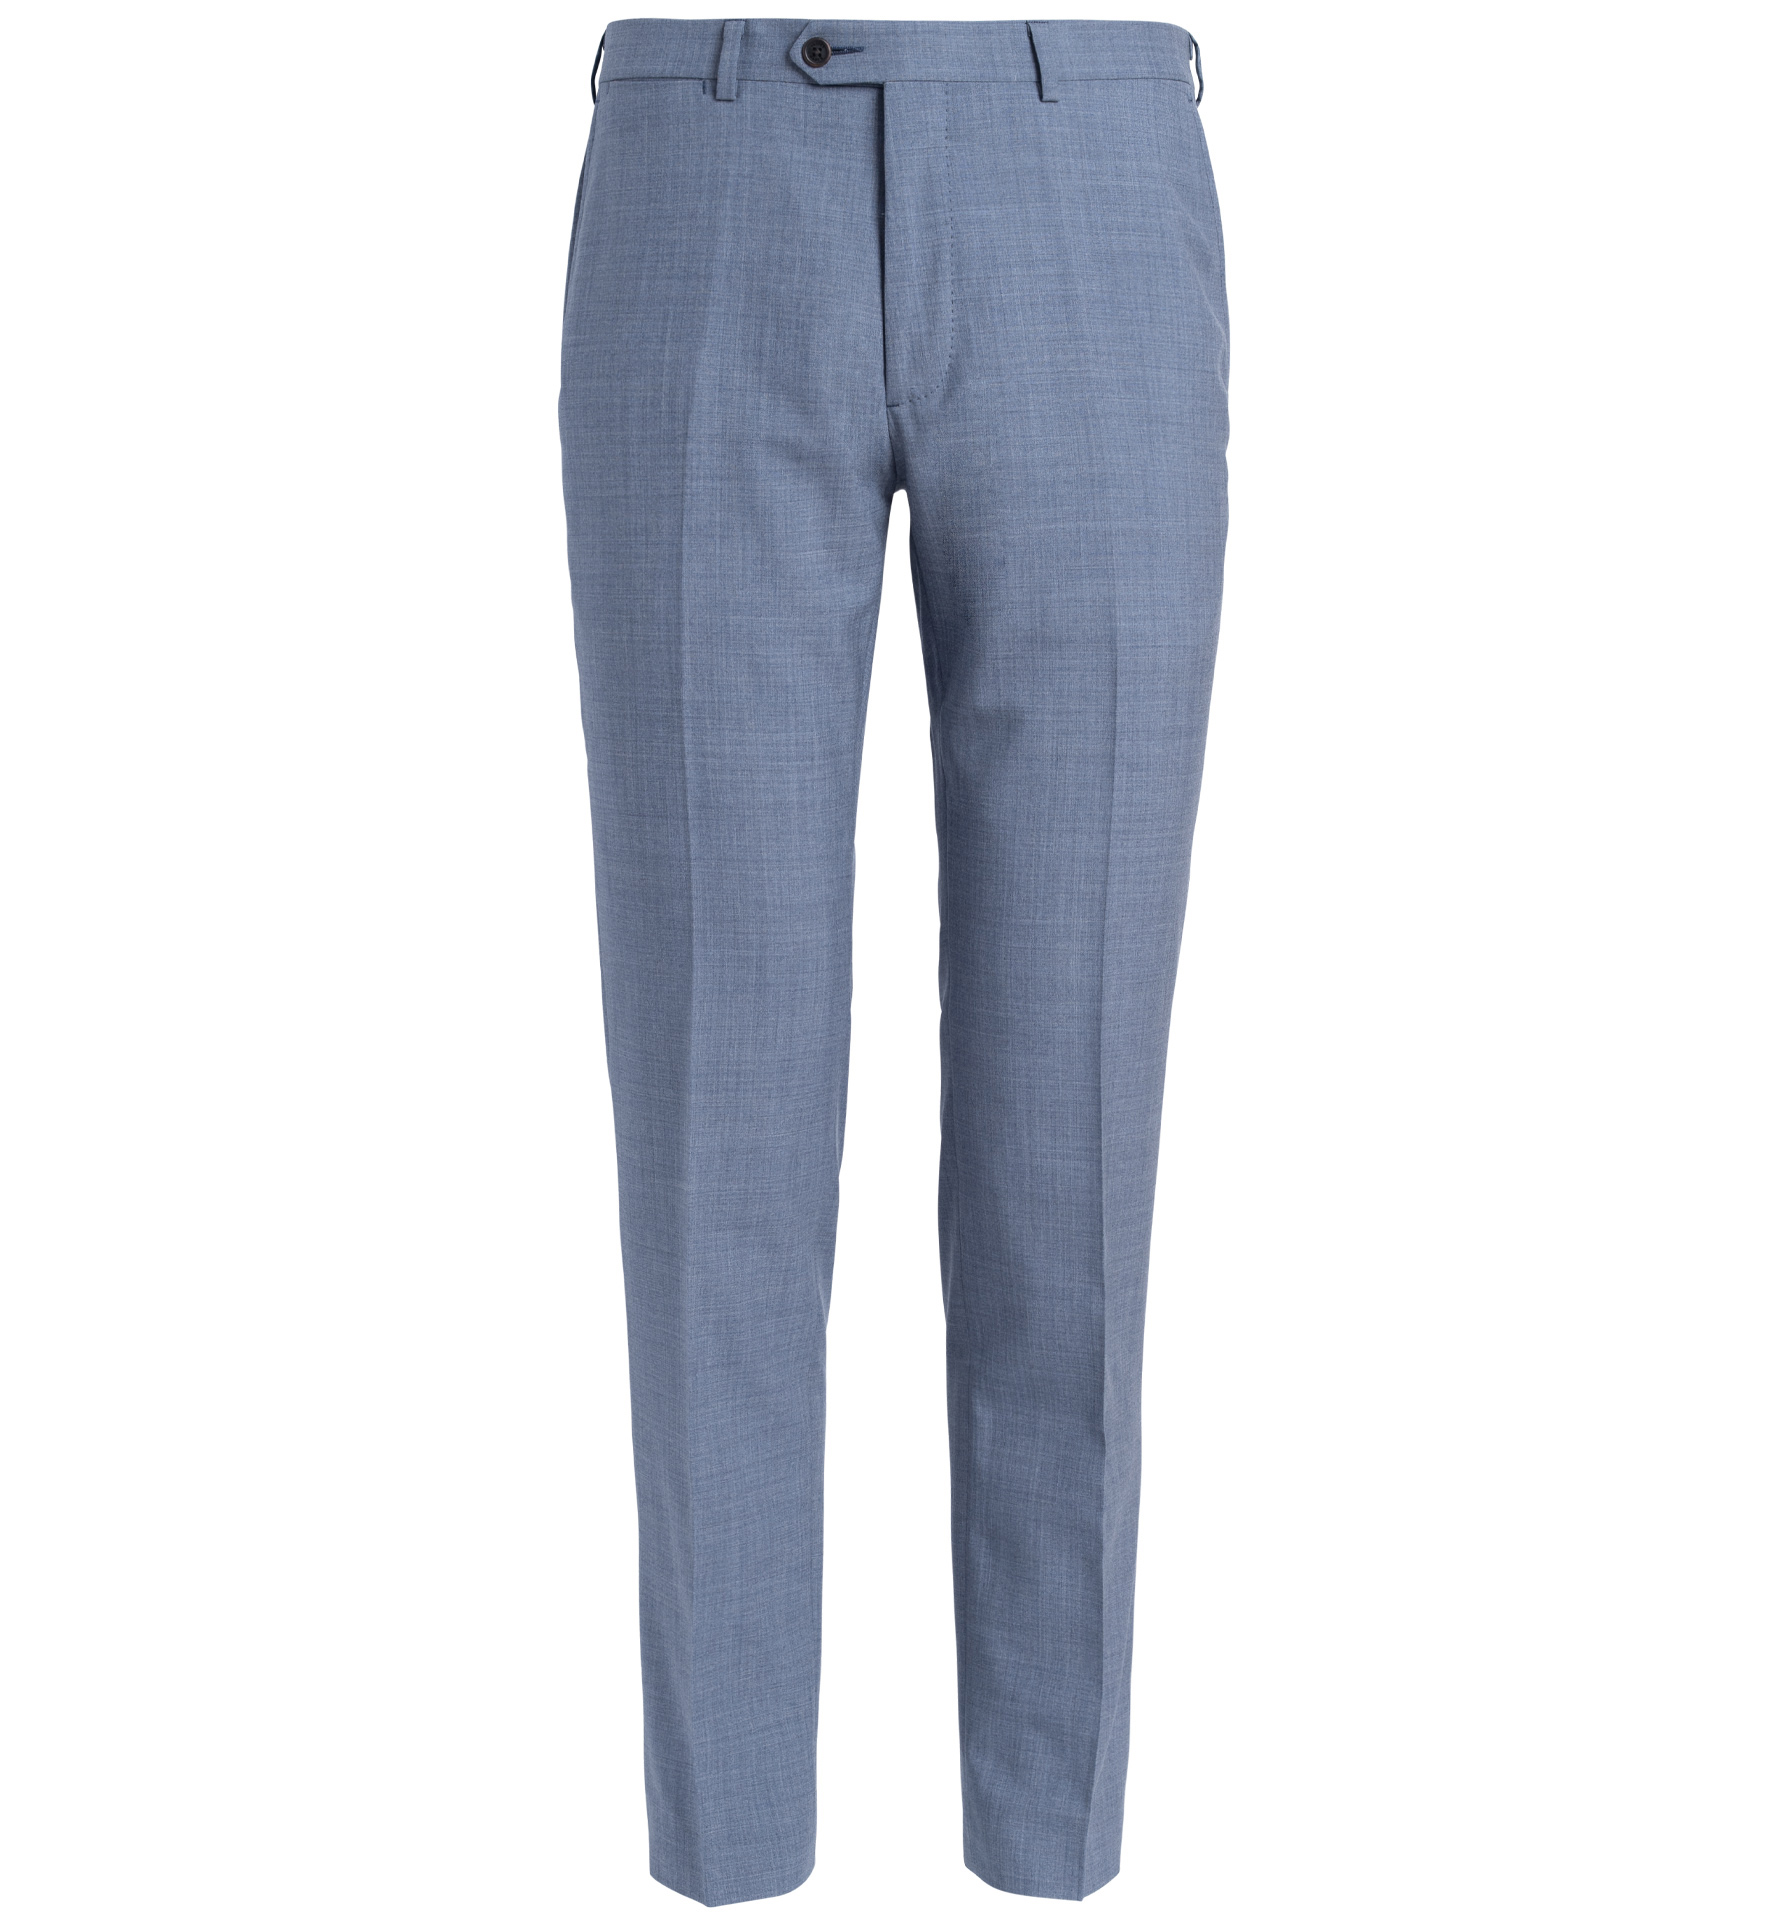 Zoom Image of Allen Light Blue S130s Tropical Wool Trouser